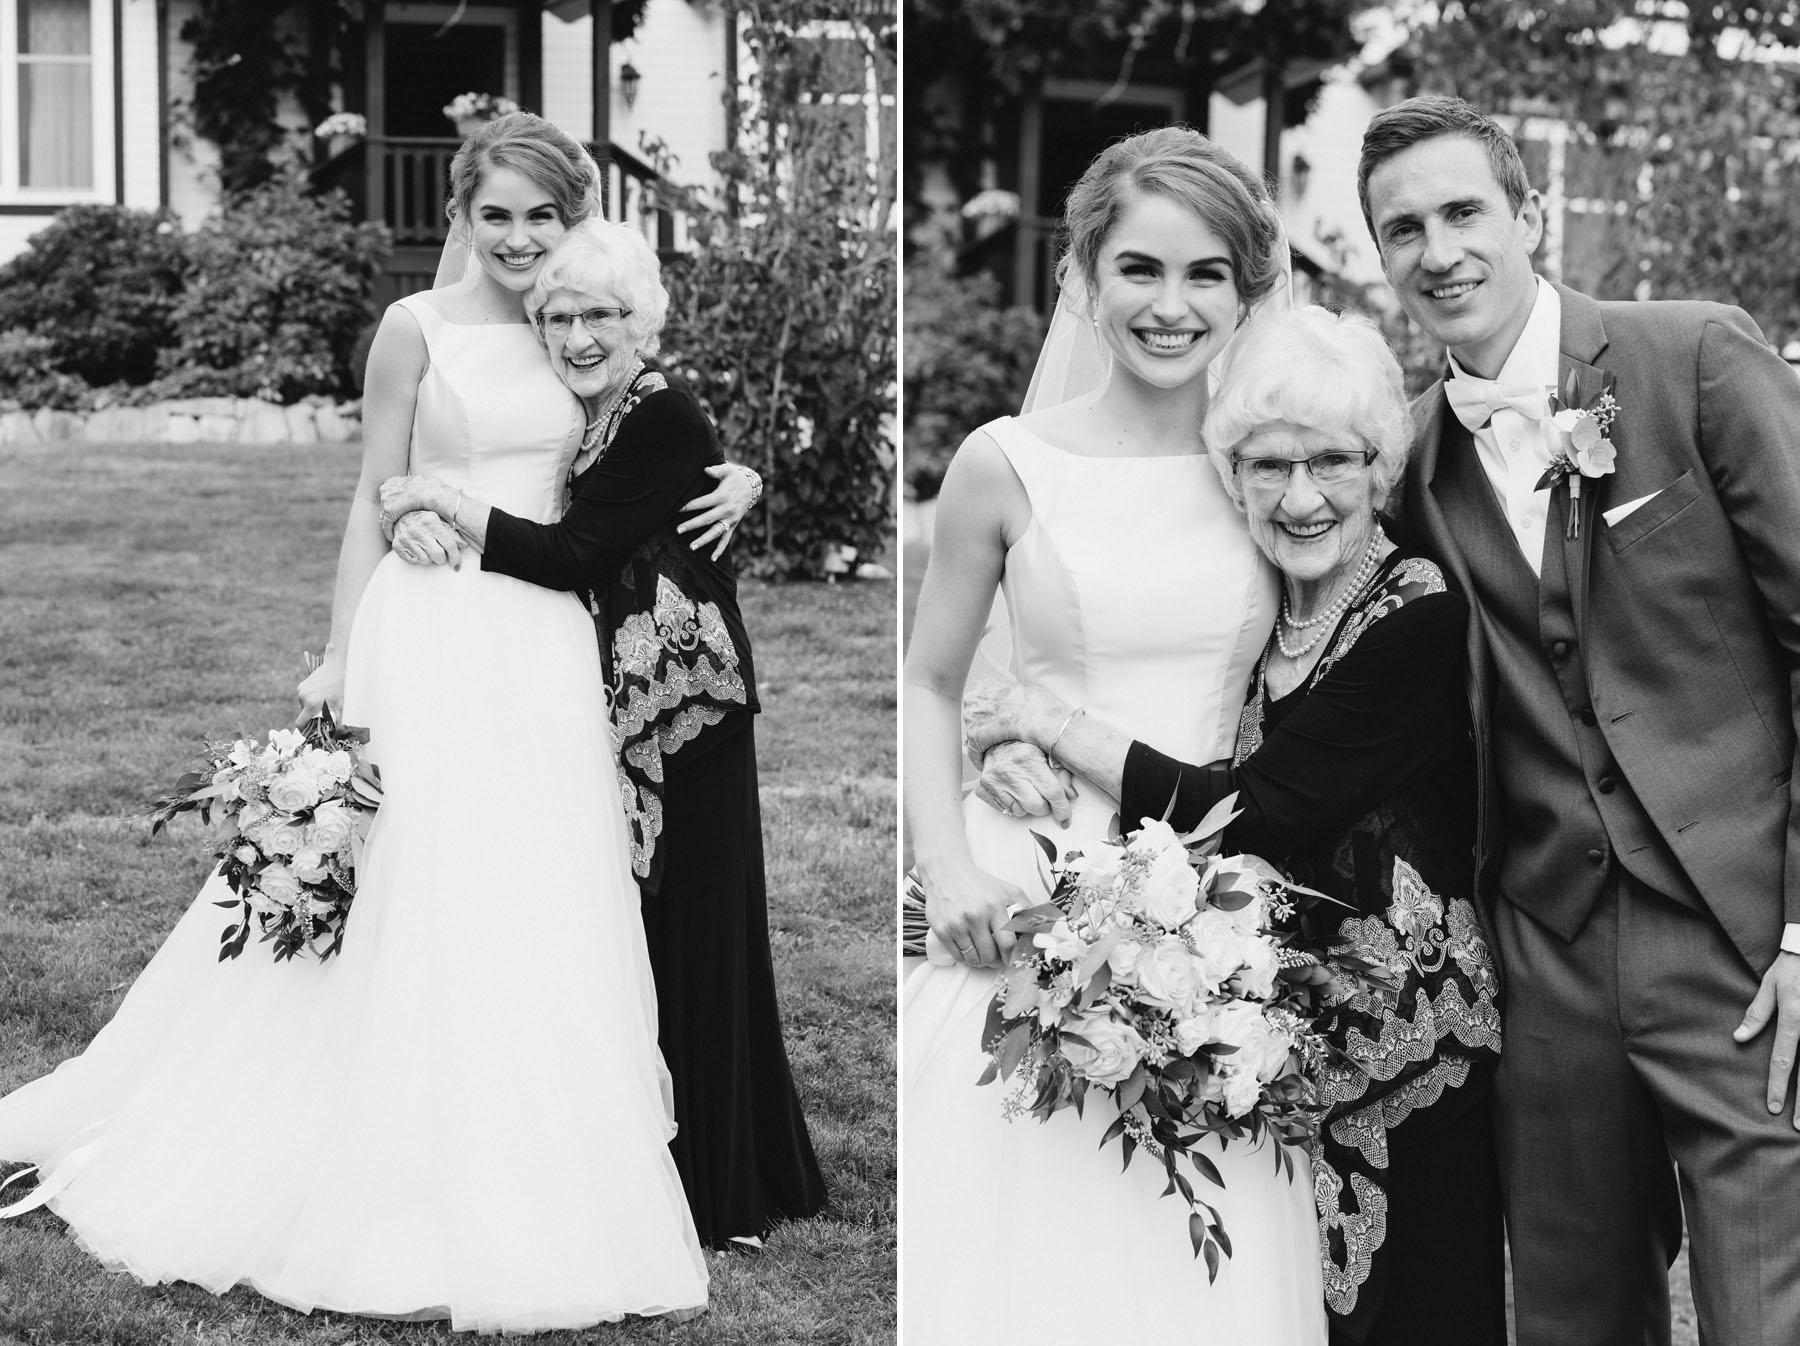 thetis-island-wedding-photographer-rp-rn-131.jpg